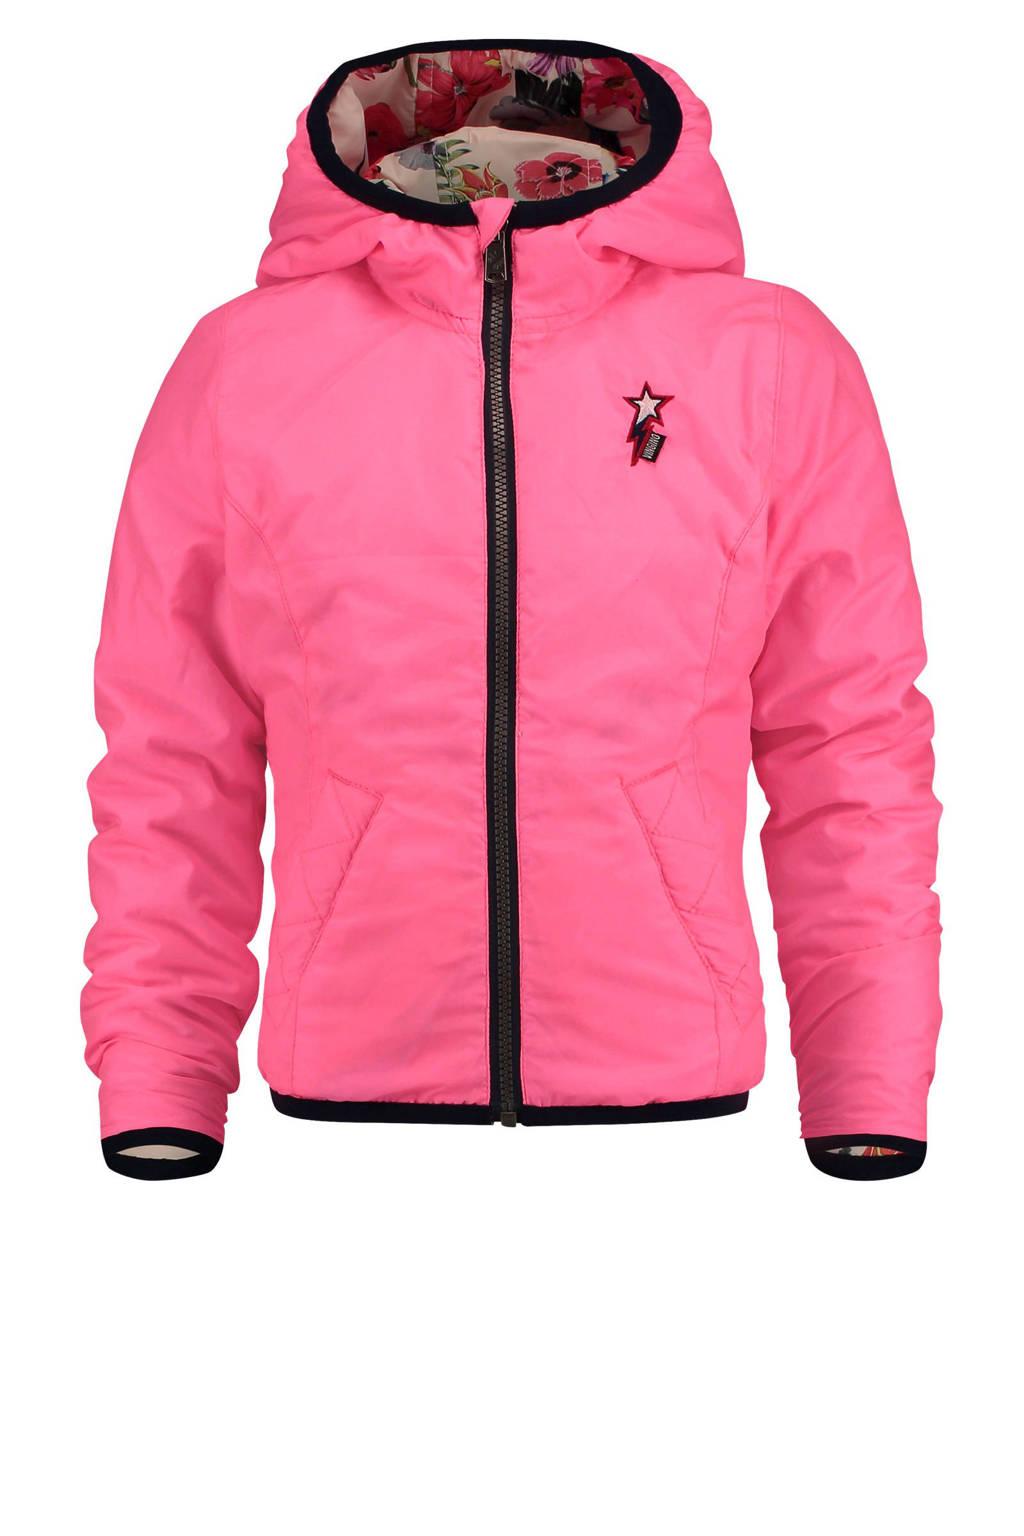 Vingino omkeerbare tussenjas Thelore roze, Felroze/multi